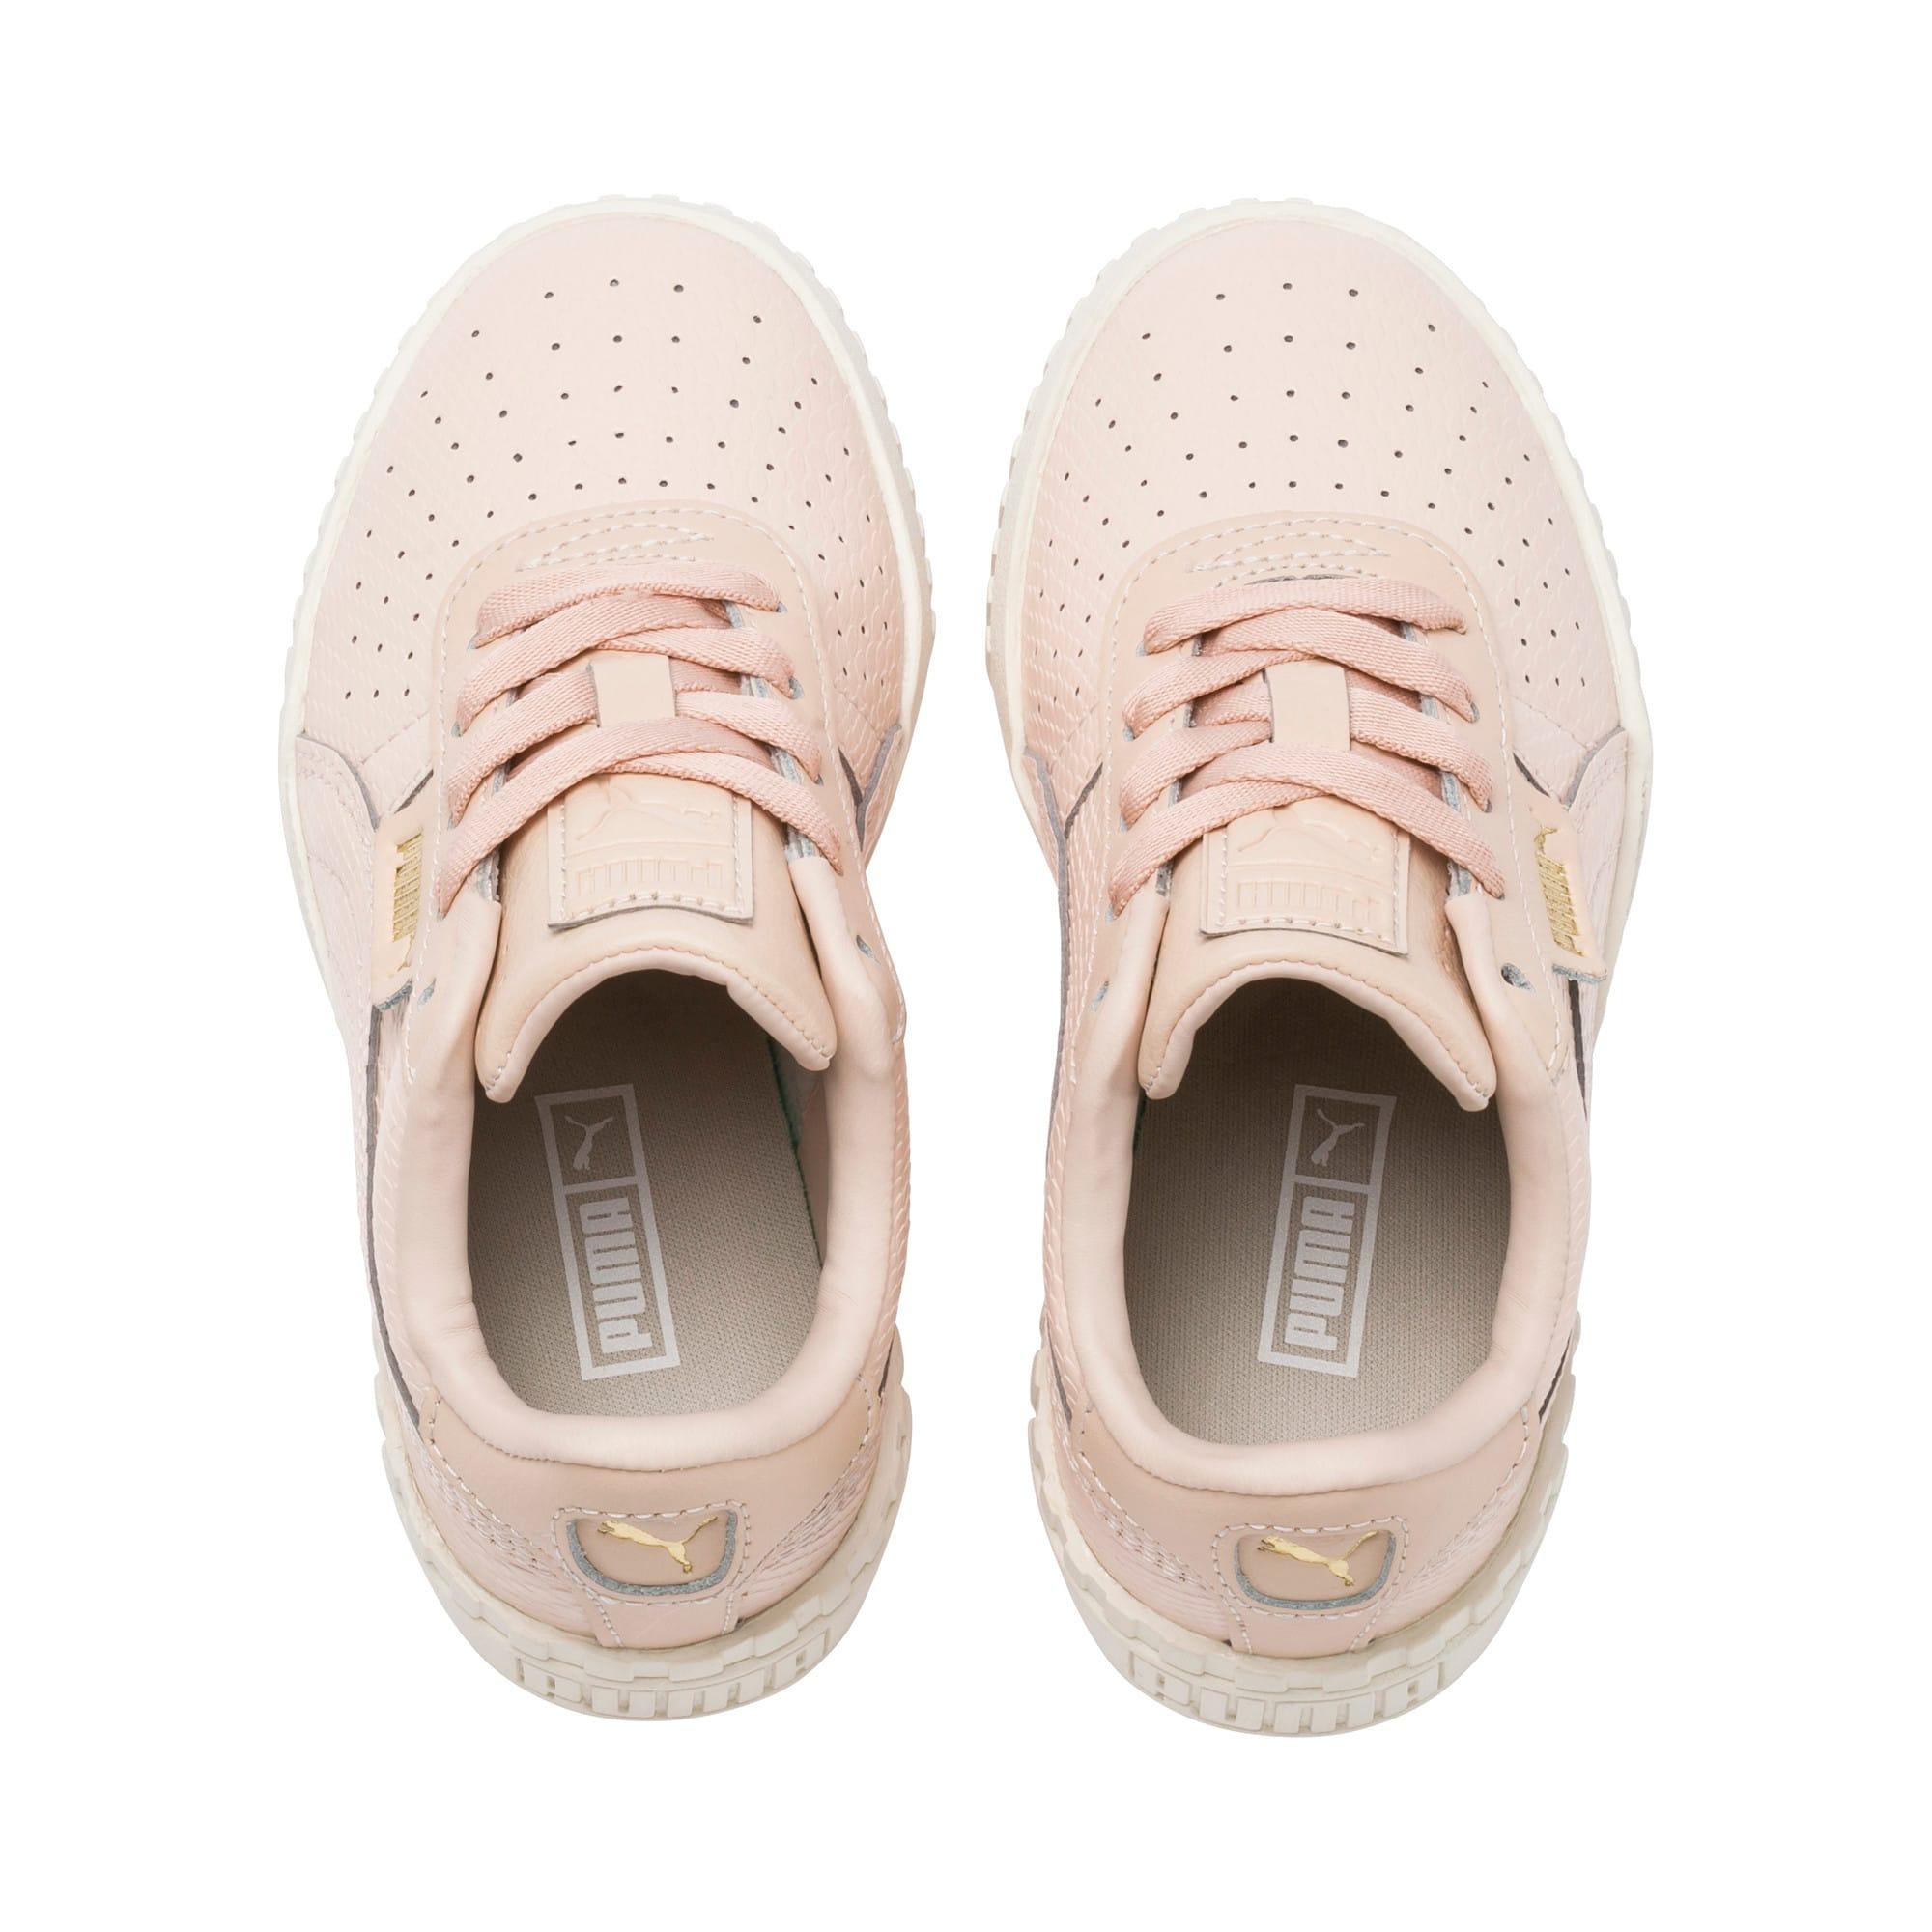 Imagen en miniatura 6 de Zapatillas de niña Cali Emboss Kid, Cream Tan-Cream Tan, mediana